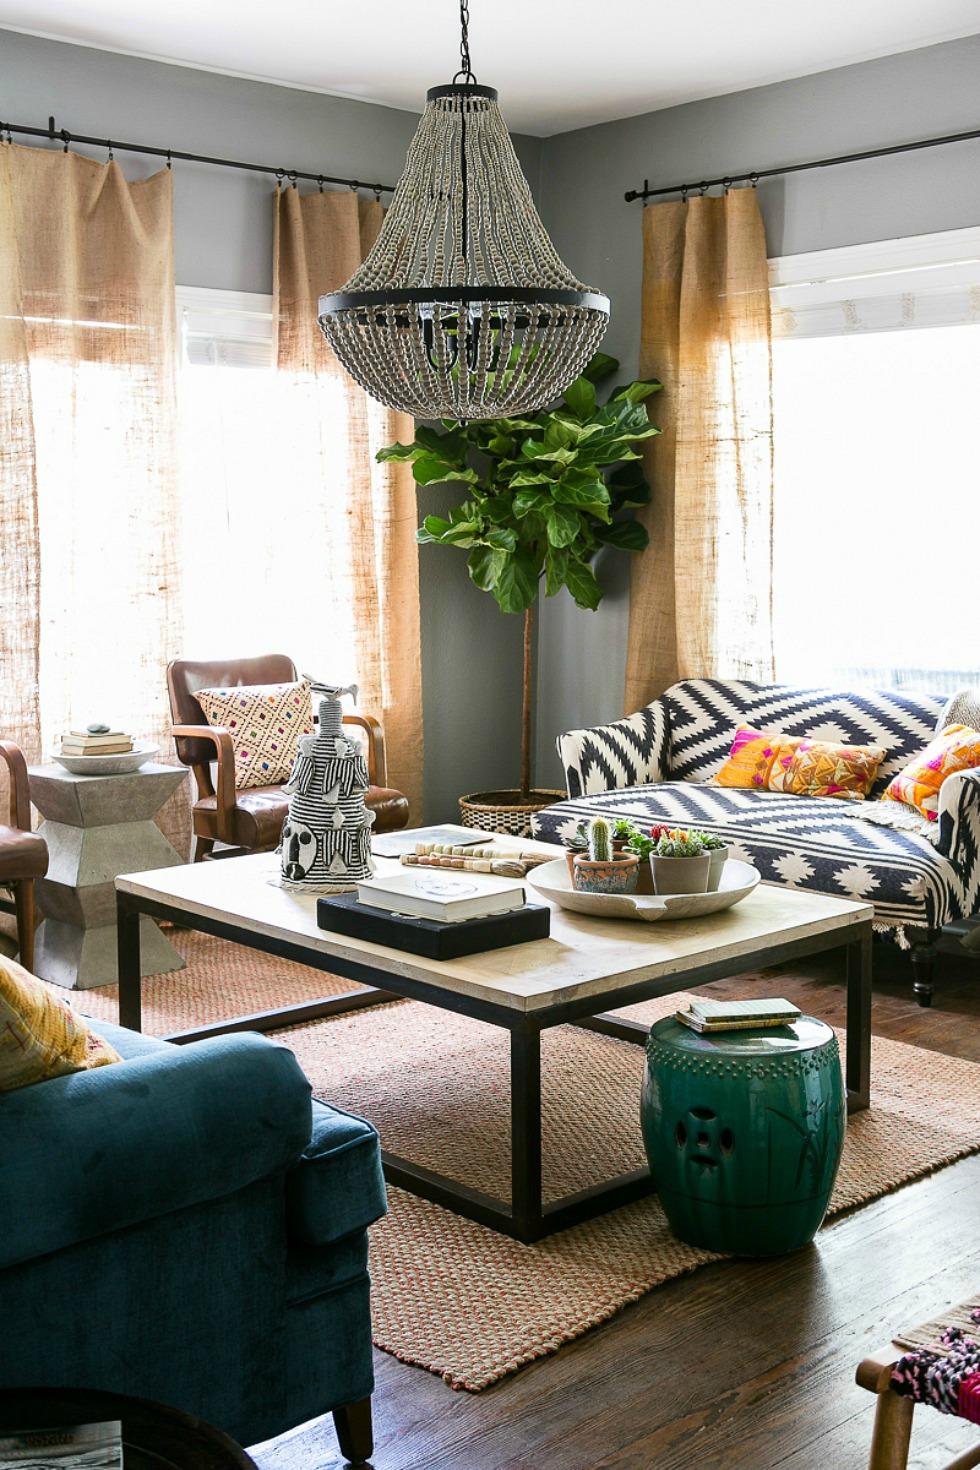 Best Kitchen Gallery: House Living Room Interior Design Design Ideas of Home Decor Designs  on rachelxblog.com